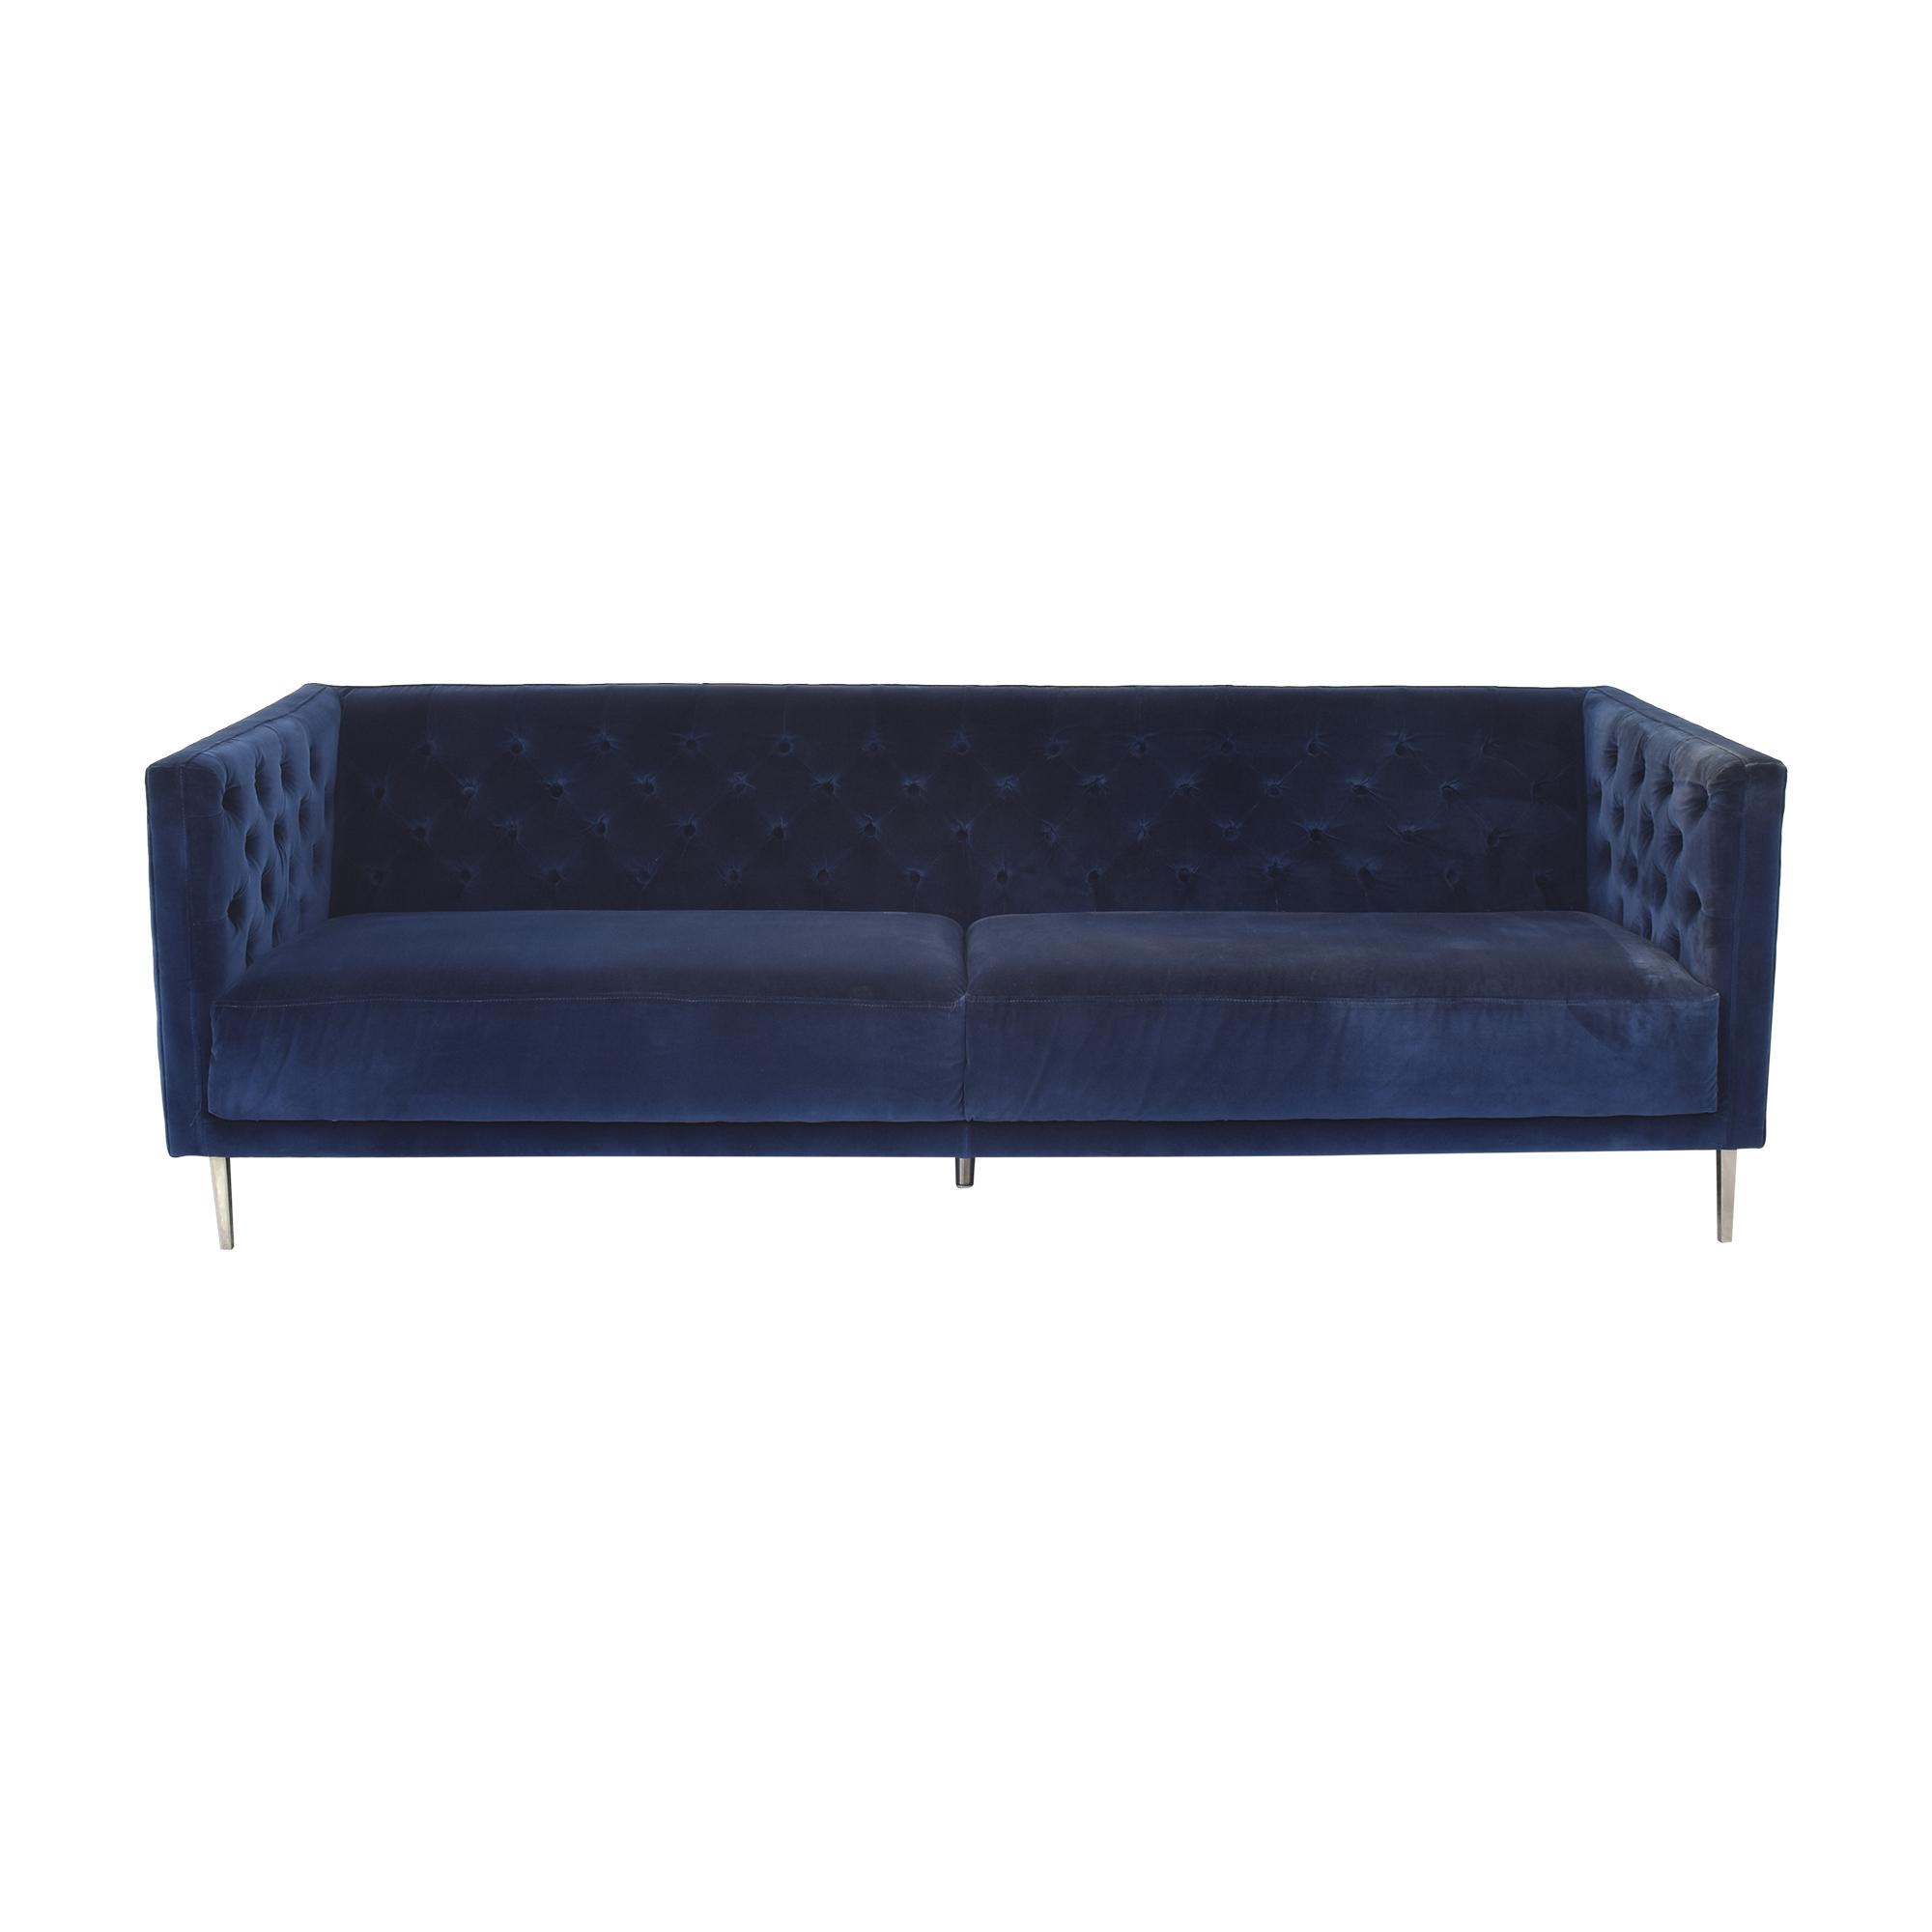 CB2 CB2 Savile Tufted Sofa blue